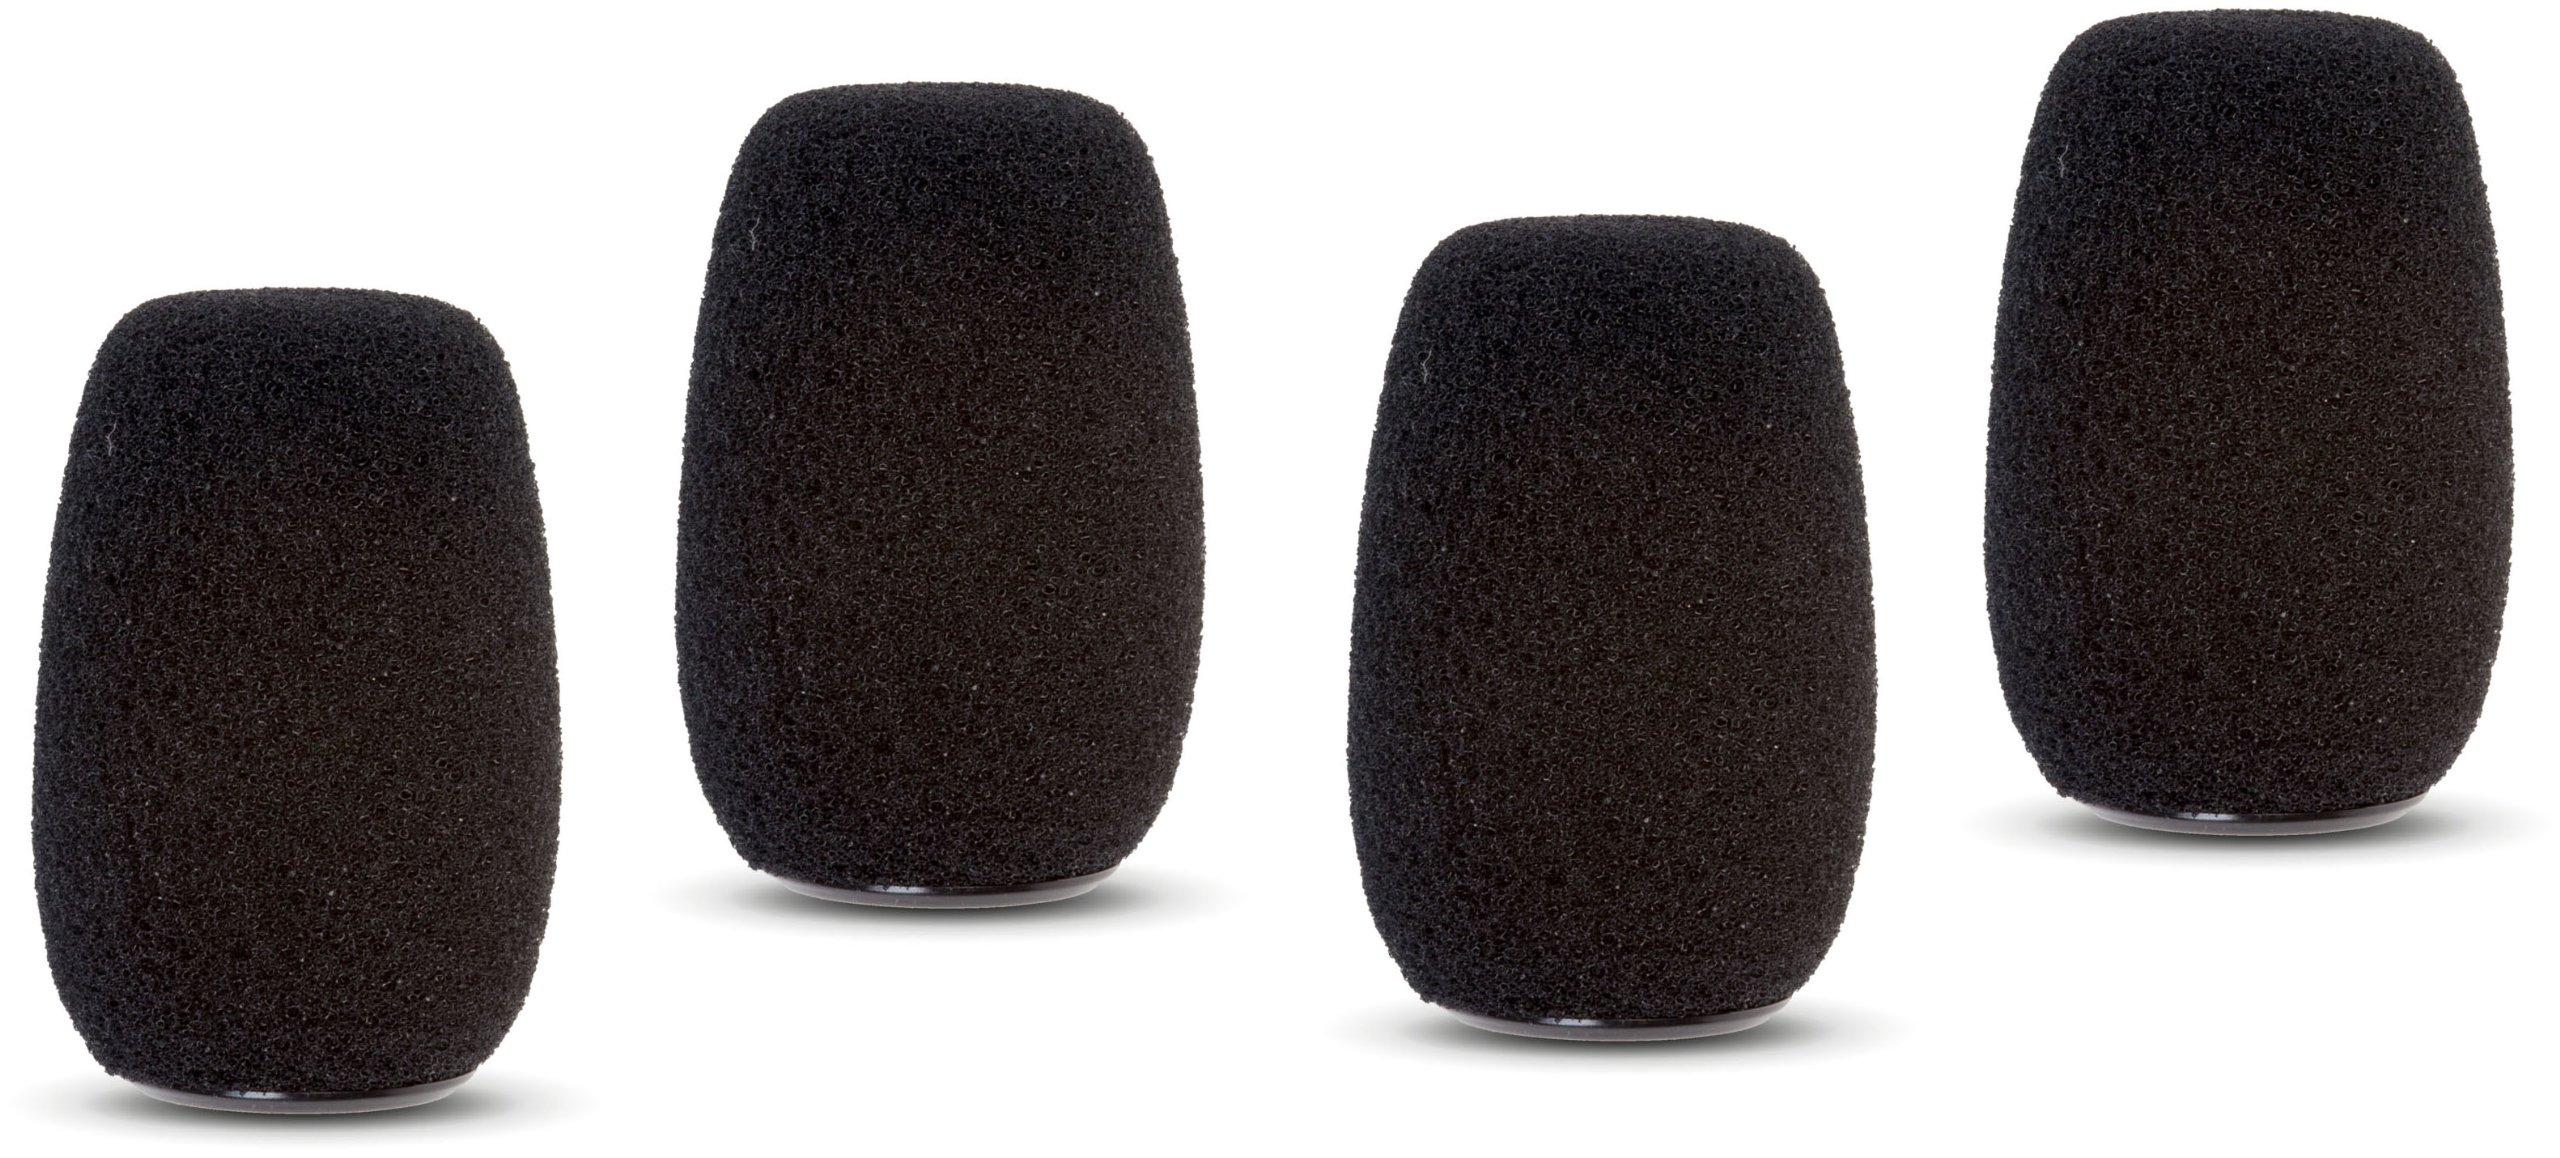 Shure ACVG4WS-B Black Foam Windscreen for Centraverse Gooseneck Condenser Microphones (Contains Four)